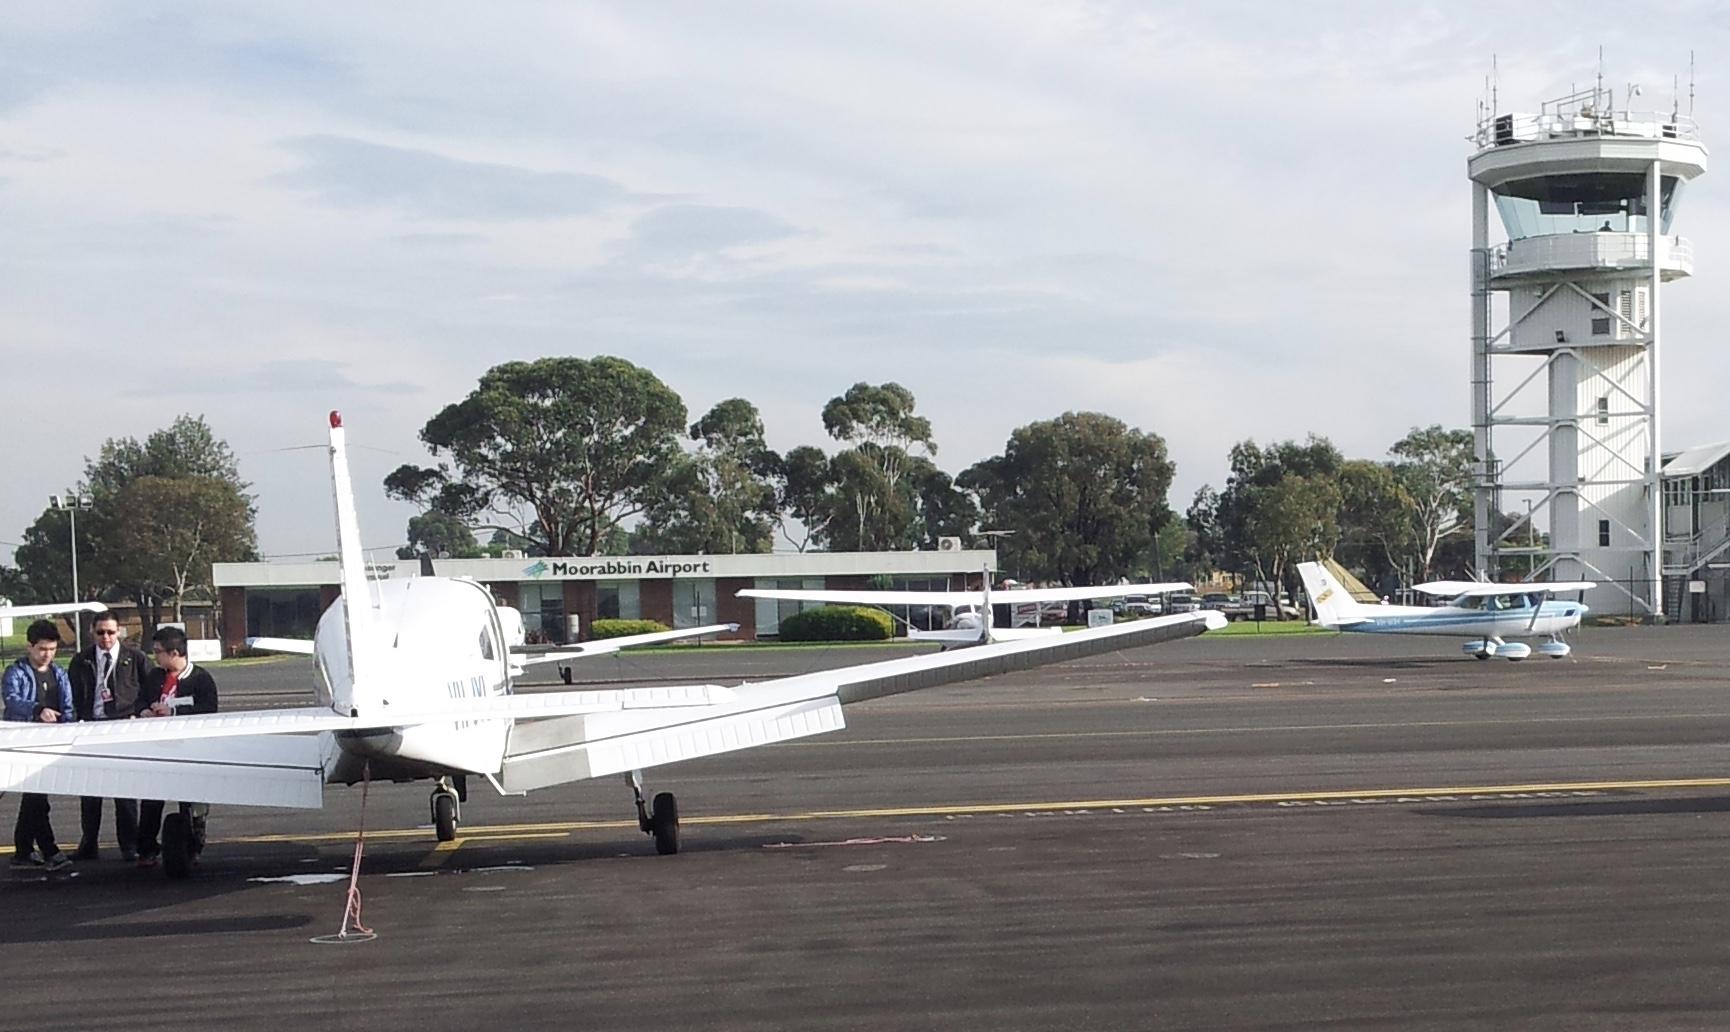 Moorabin airport